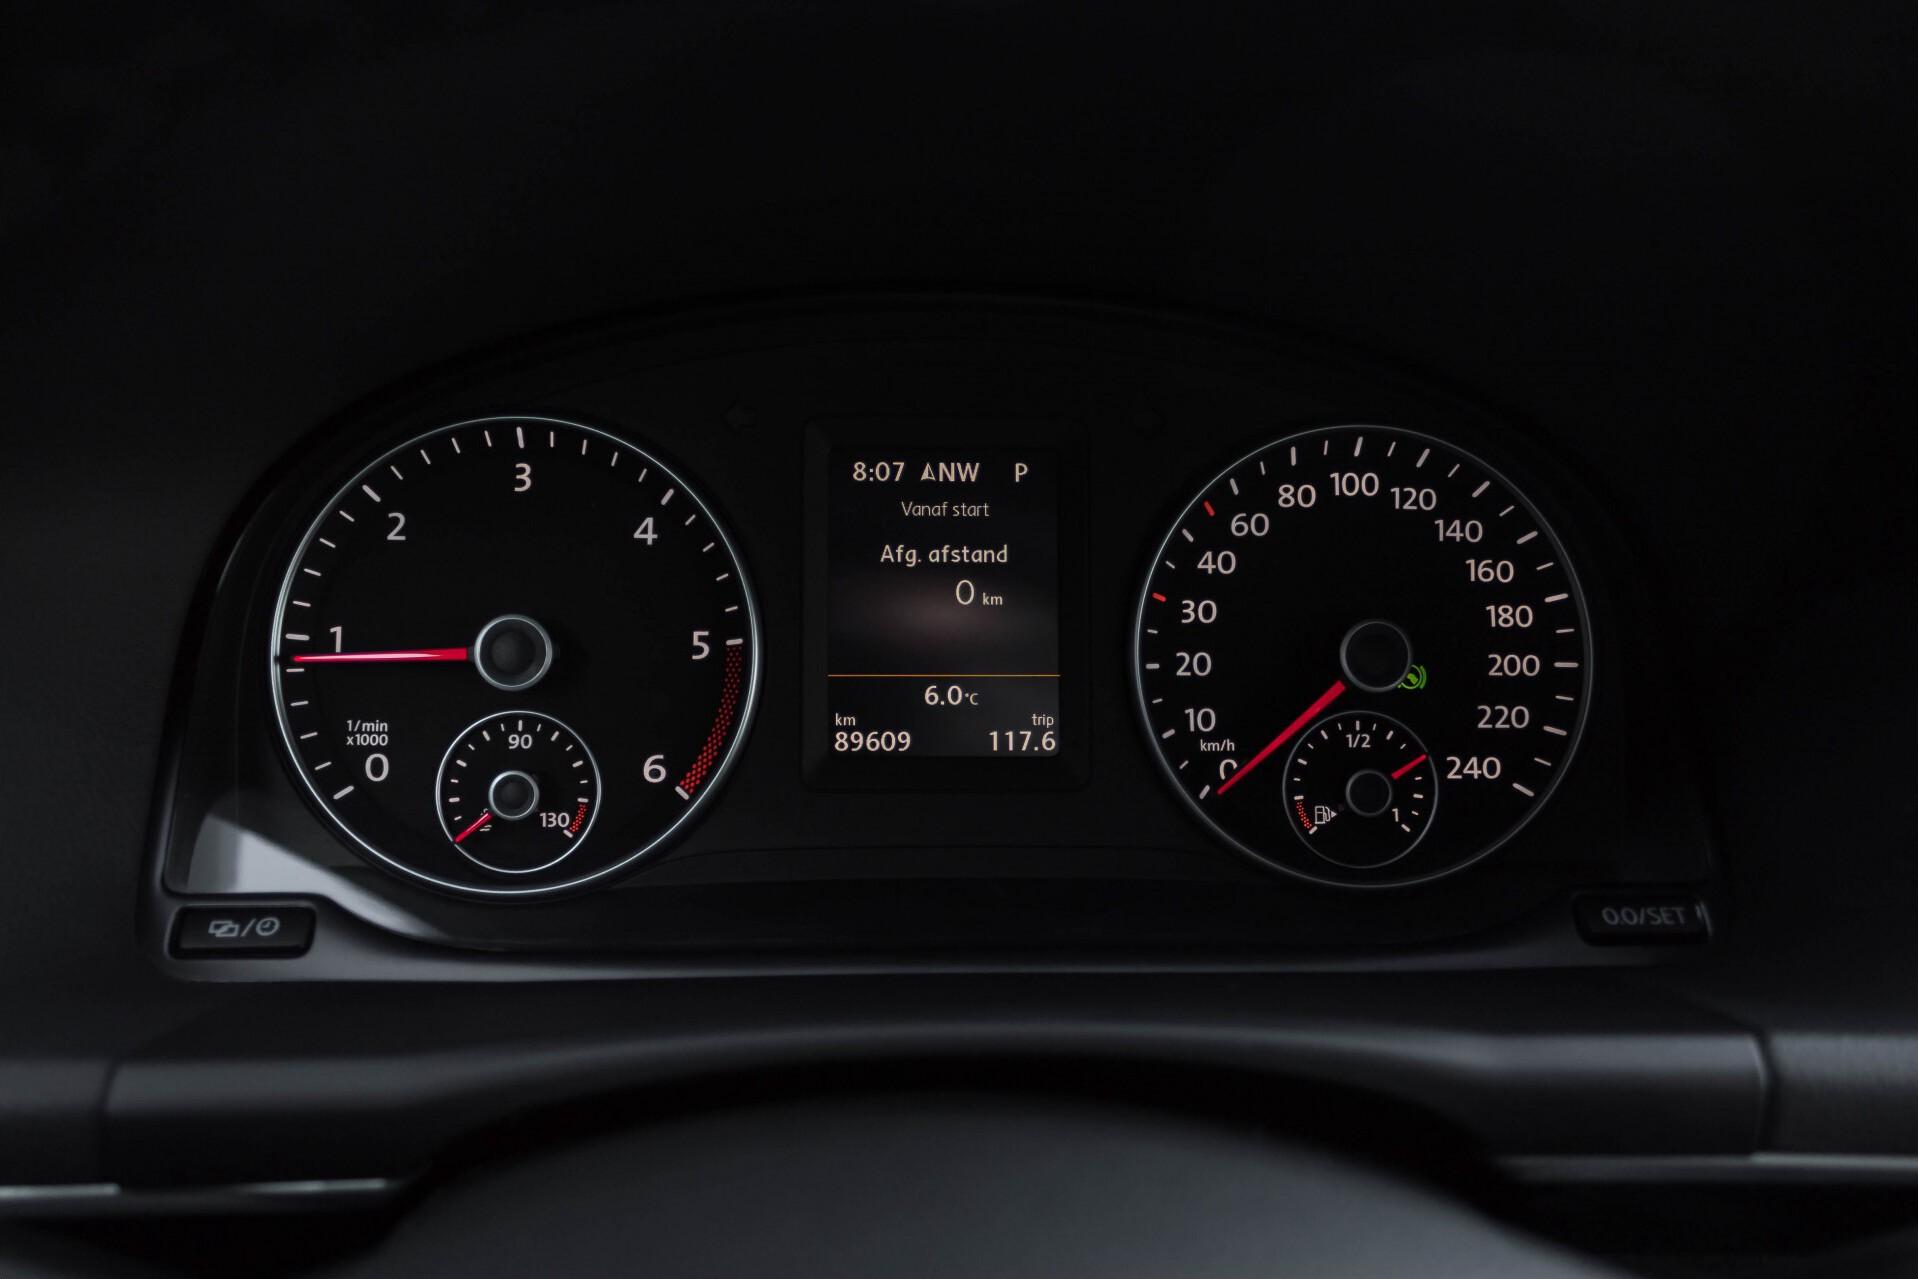 Volkswagen Touran 2.0 TDI Highline 7Persoons 177pk Panorama/Leder/Navi/Camera/Verw-Stln/Trhk/ECC/Xenon Aut Foto 13